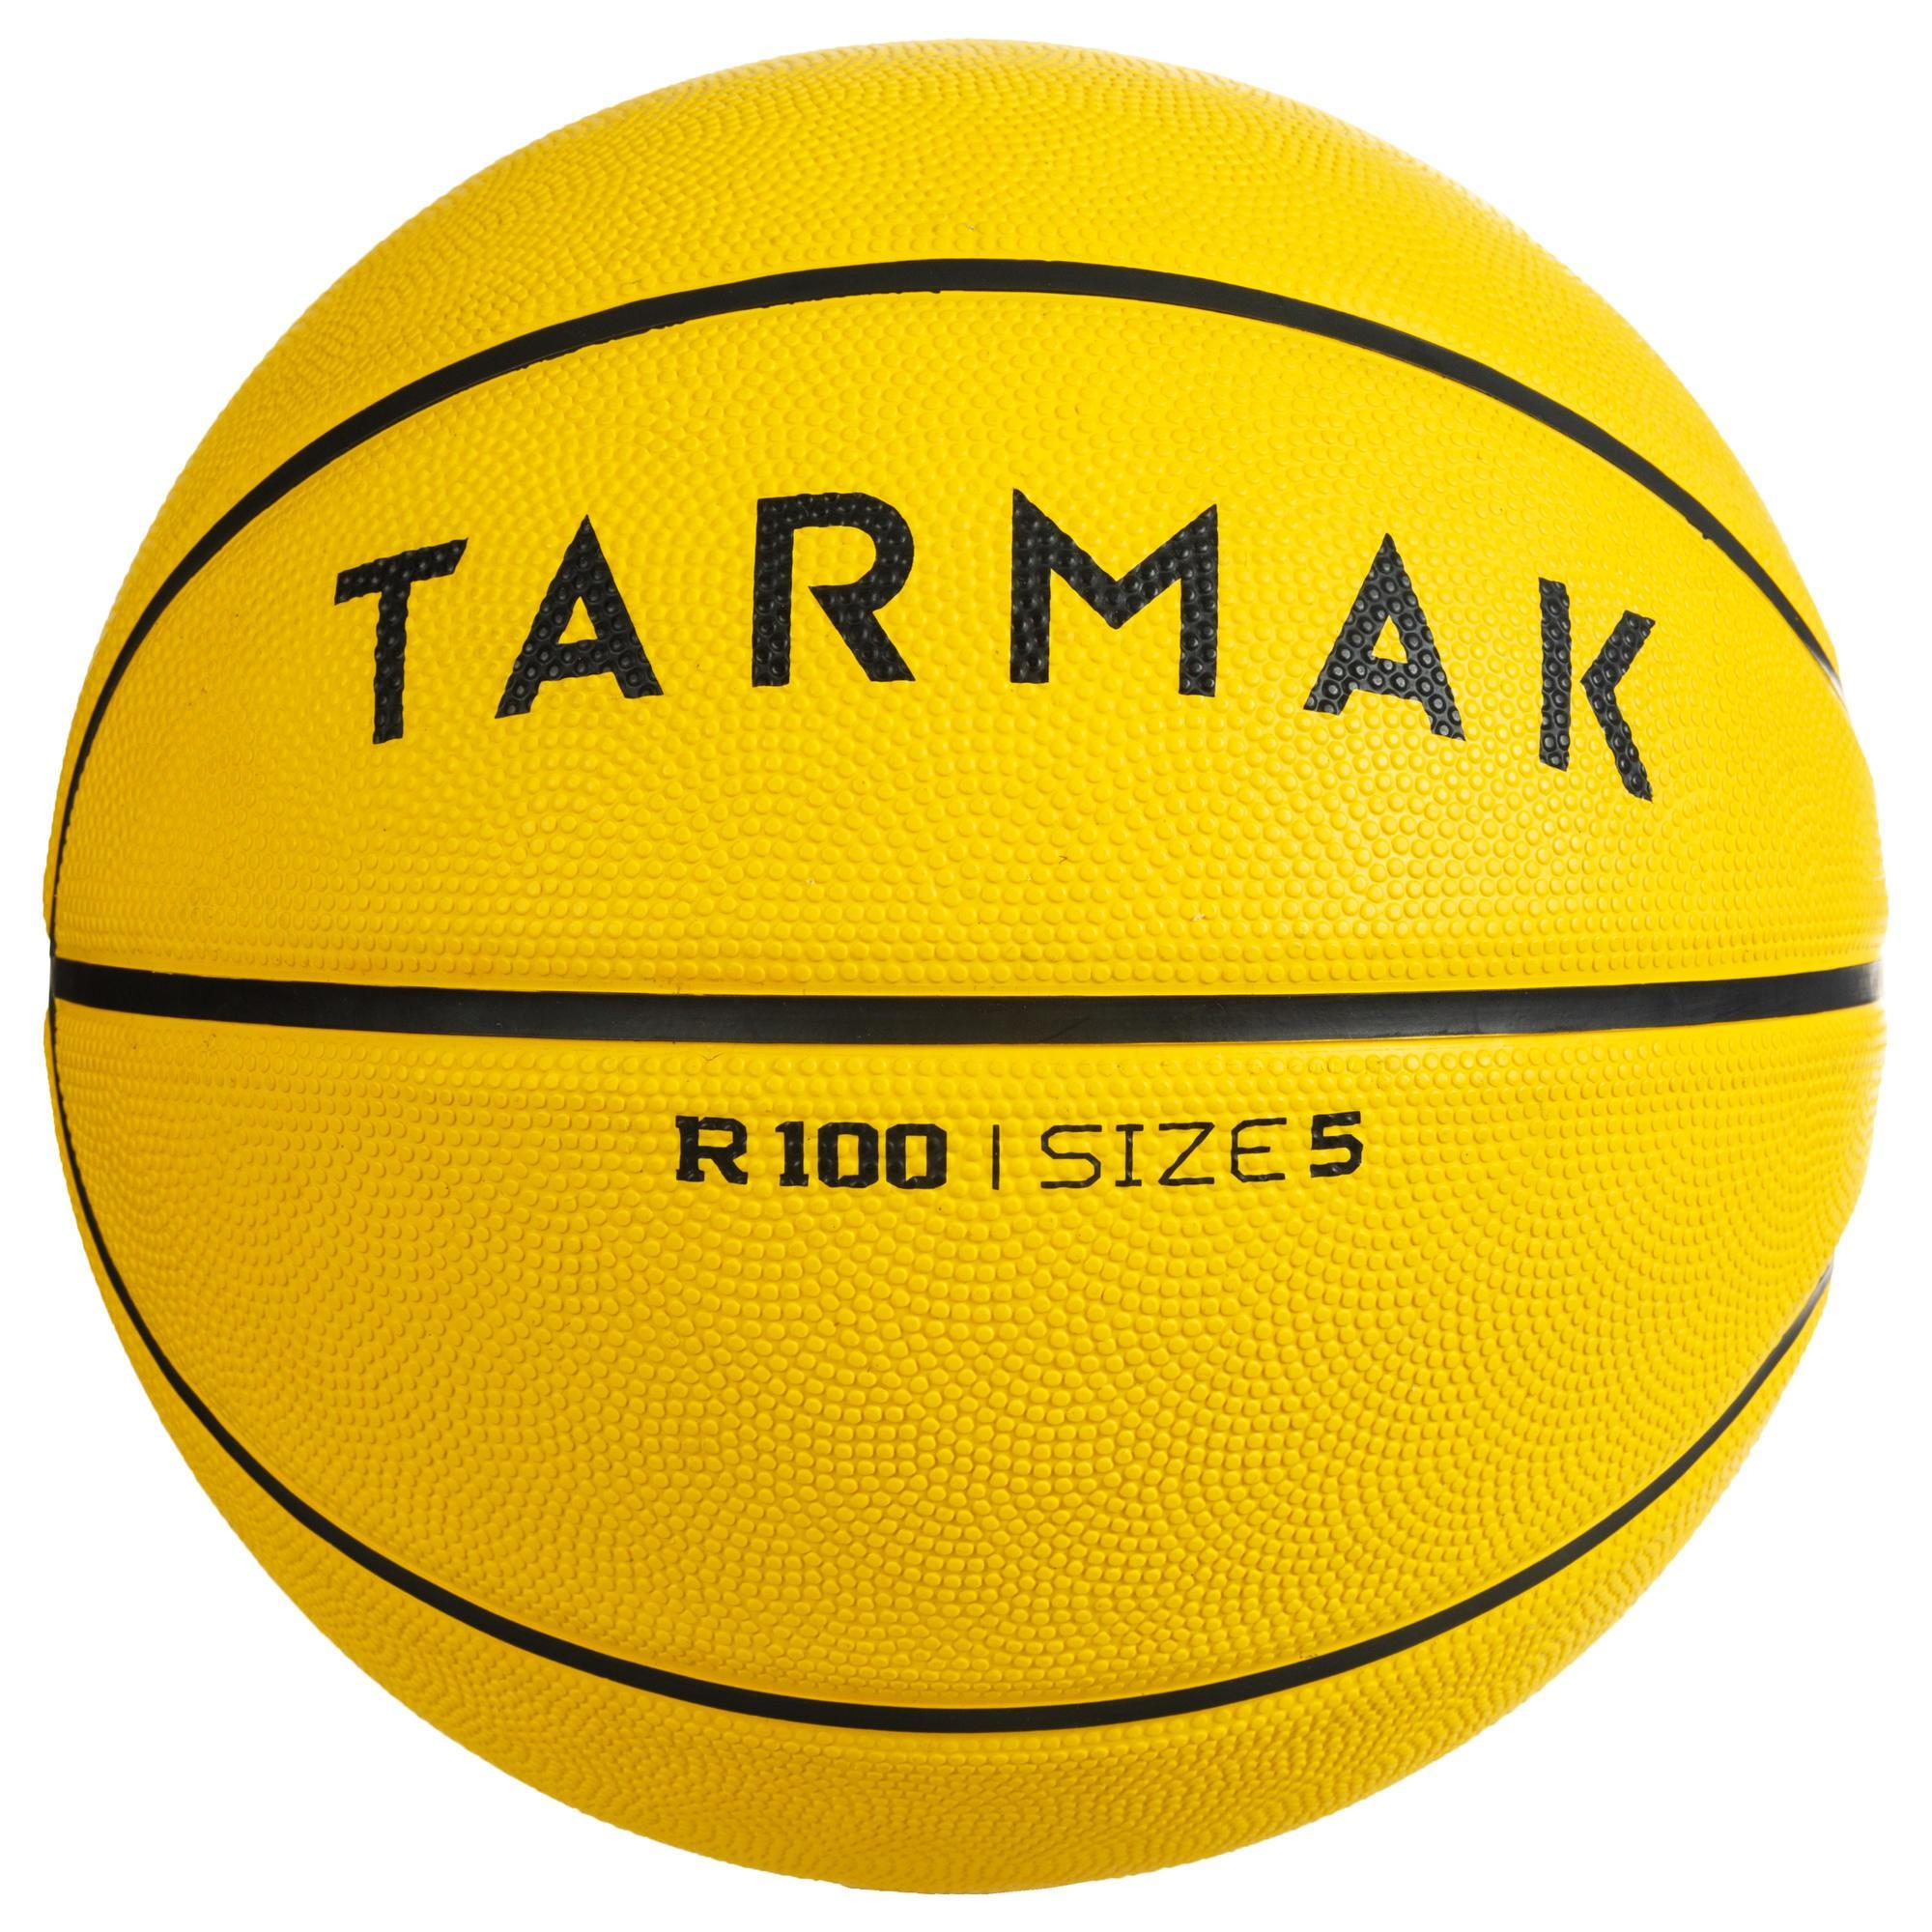 Basketball R100 Größe 5 Kinder gelb Einsteiger robust